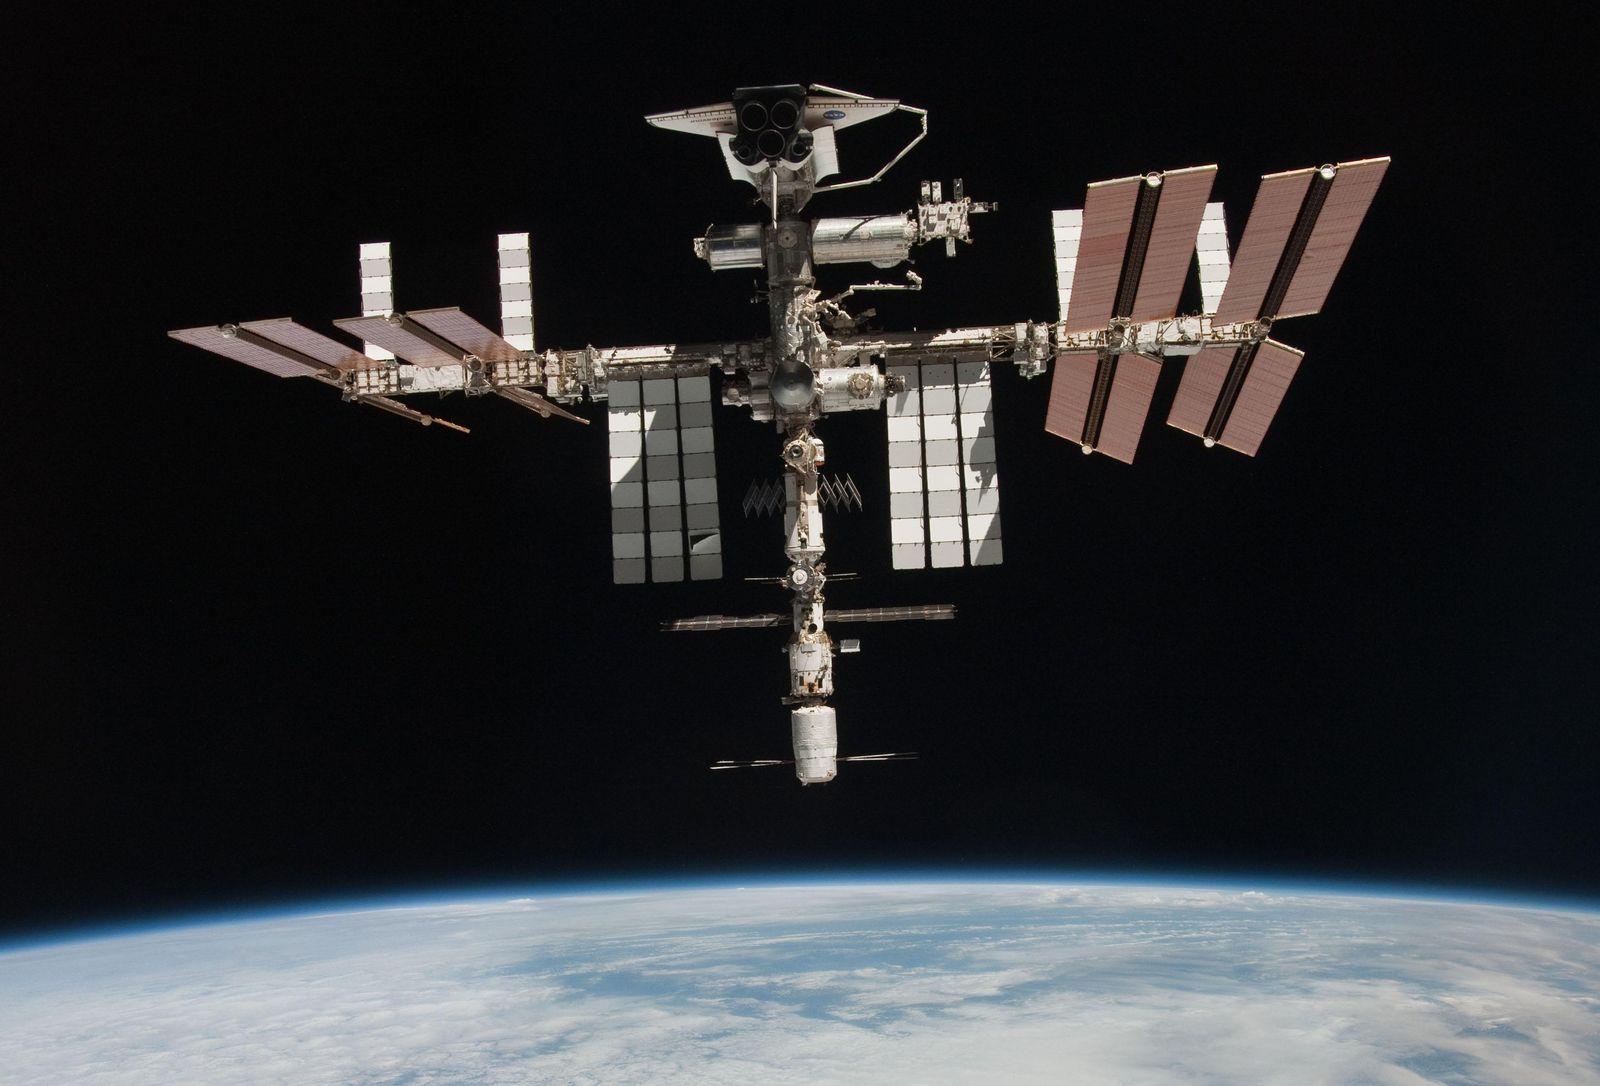 Raumstation ISS / NASA / Sojus